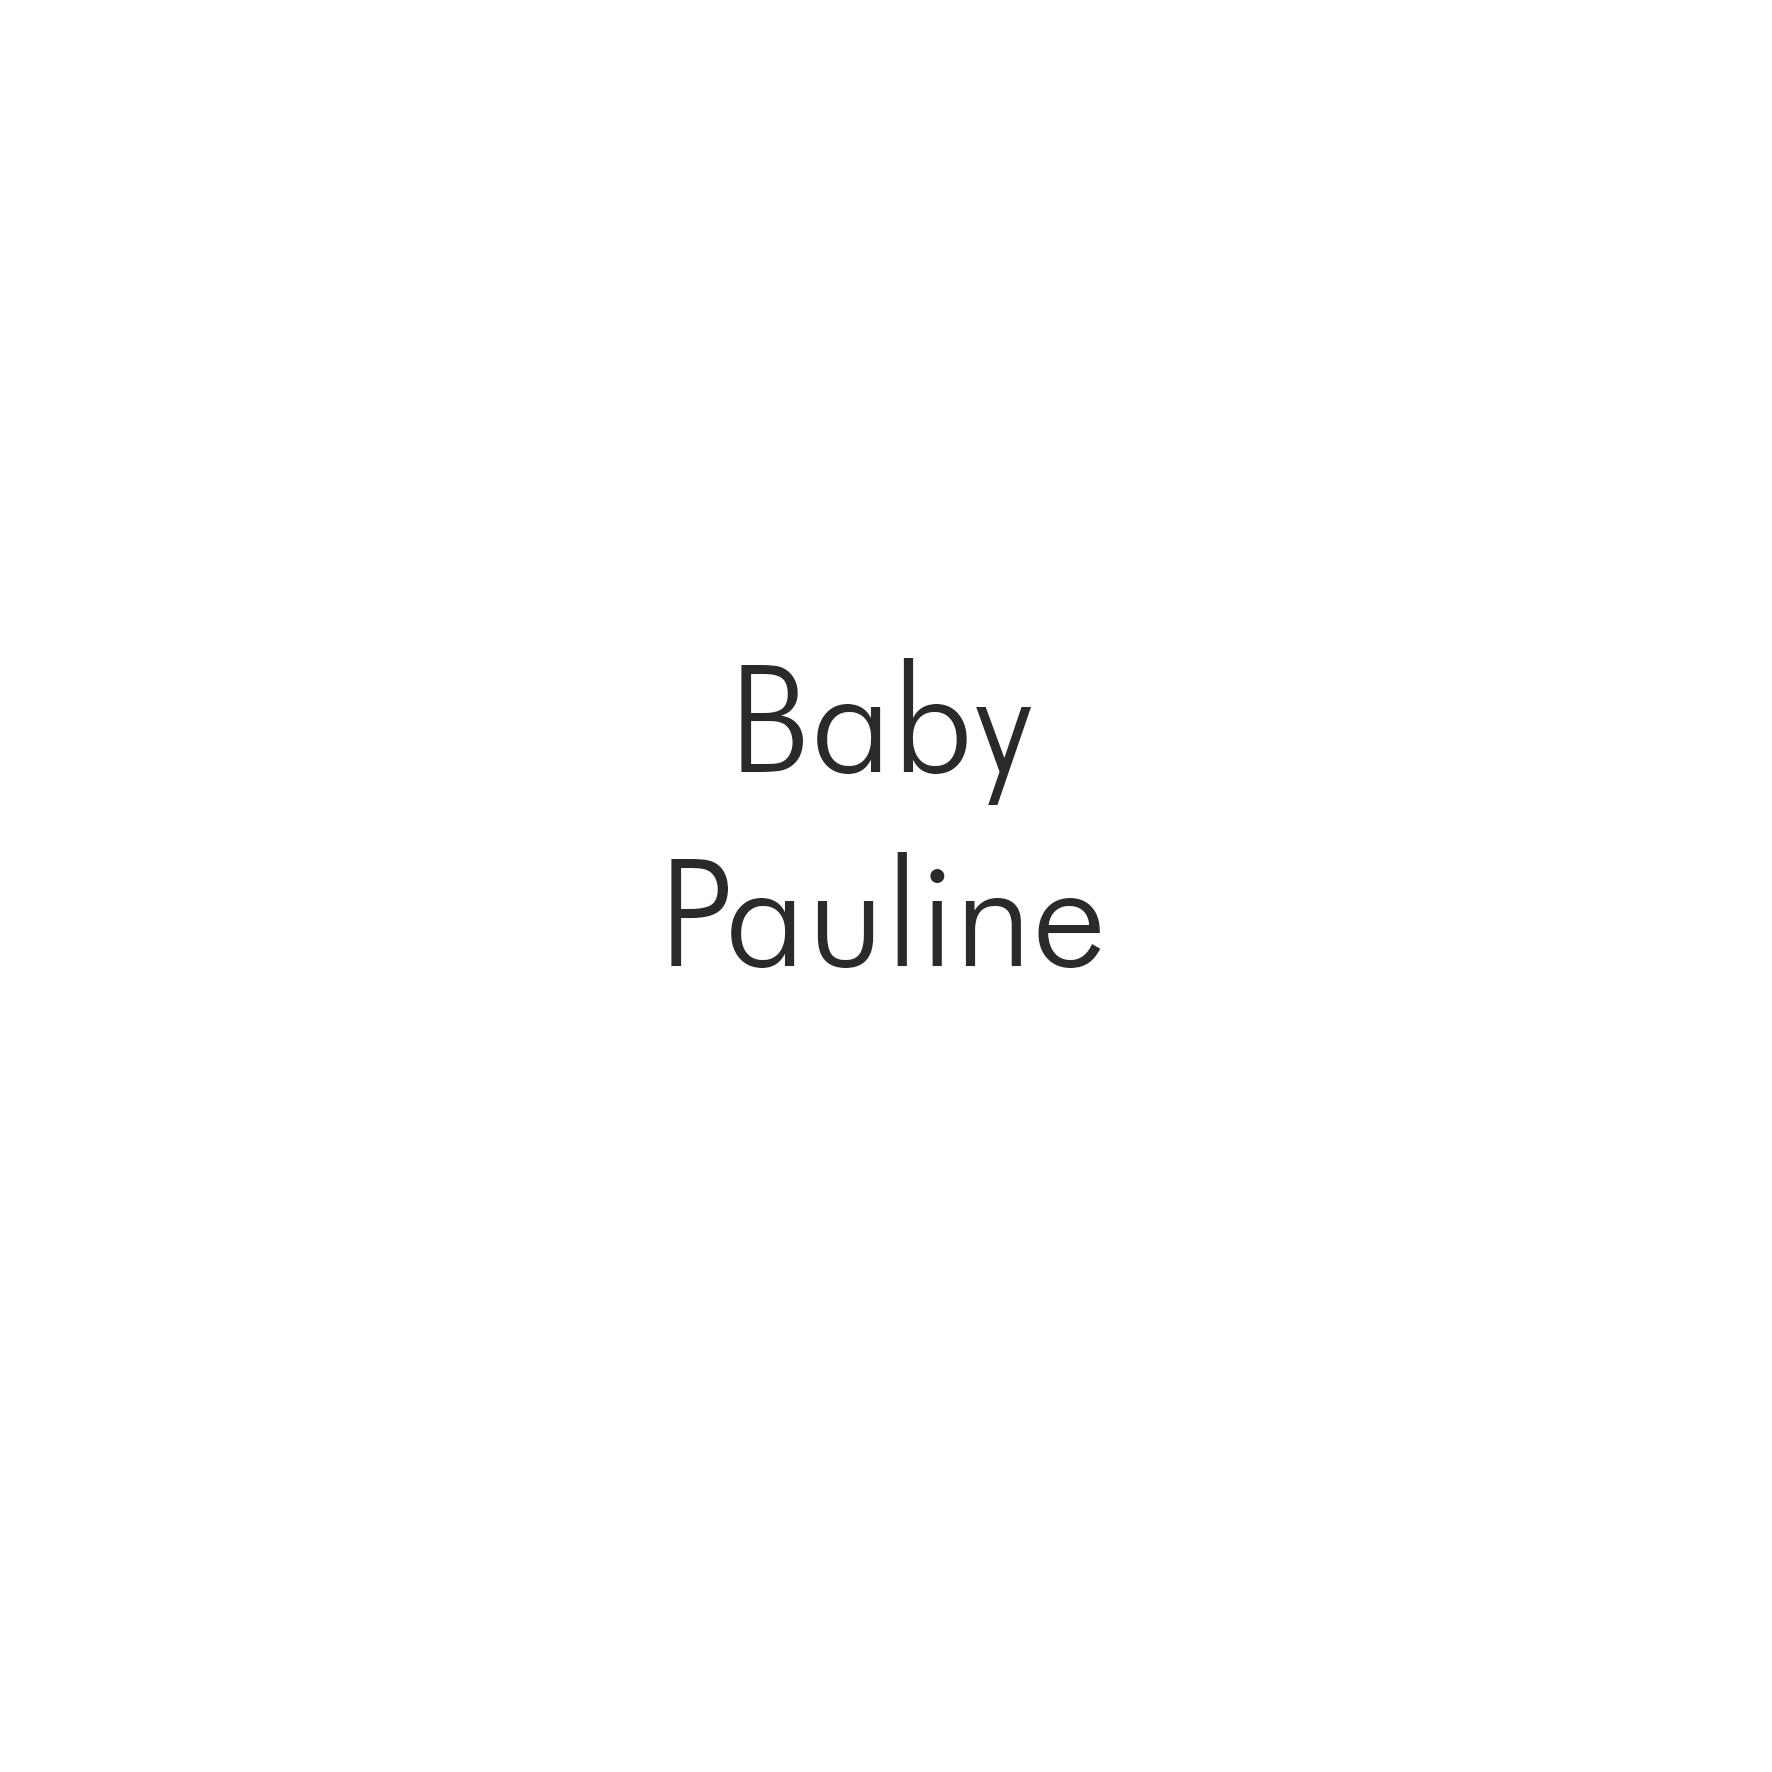 Baby Pauline.png